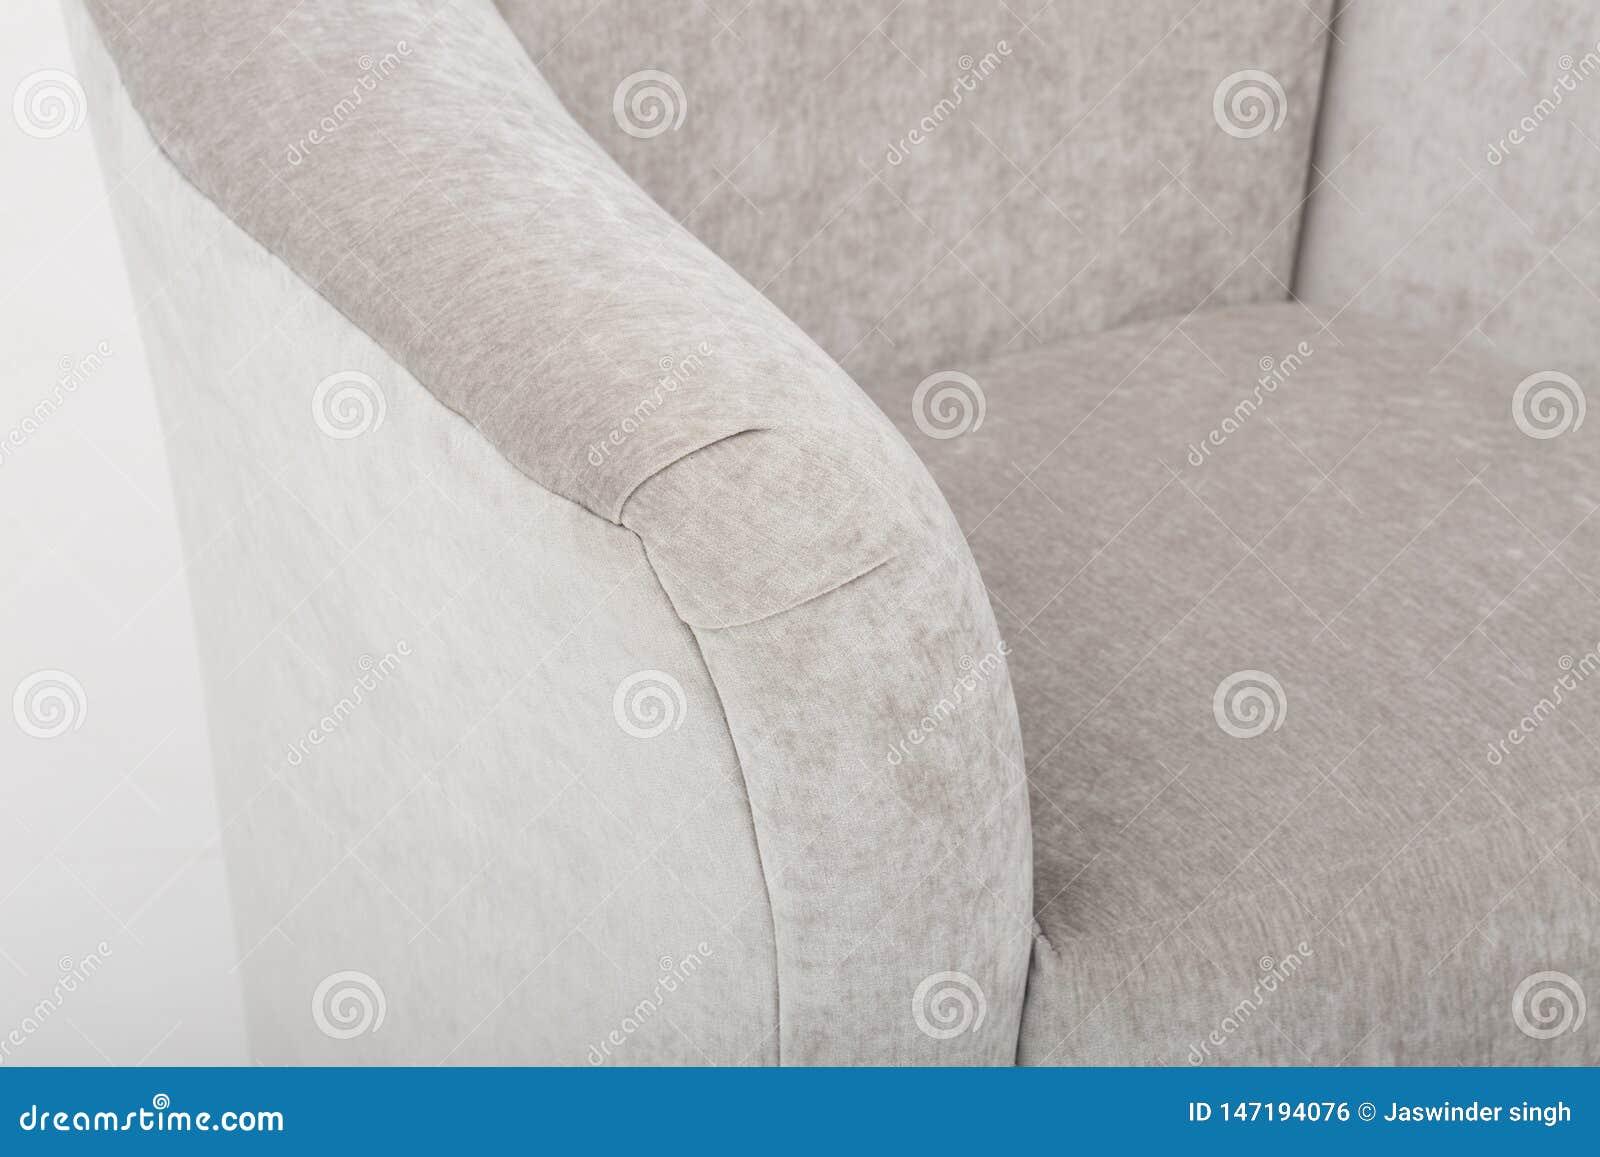 Seats cozy leather sofa, 2 seater modern sofa in light grey fabric, 2-Seat Sofa, Feather Cushion Sofa, - Image